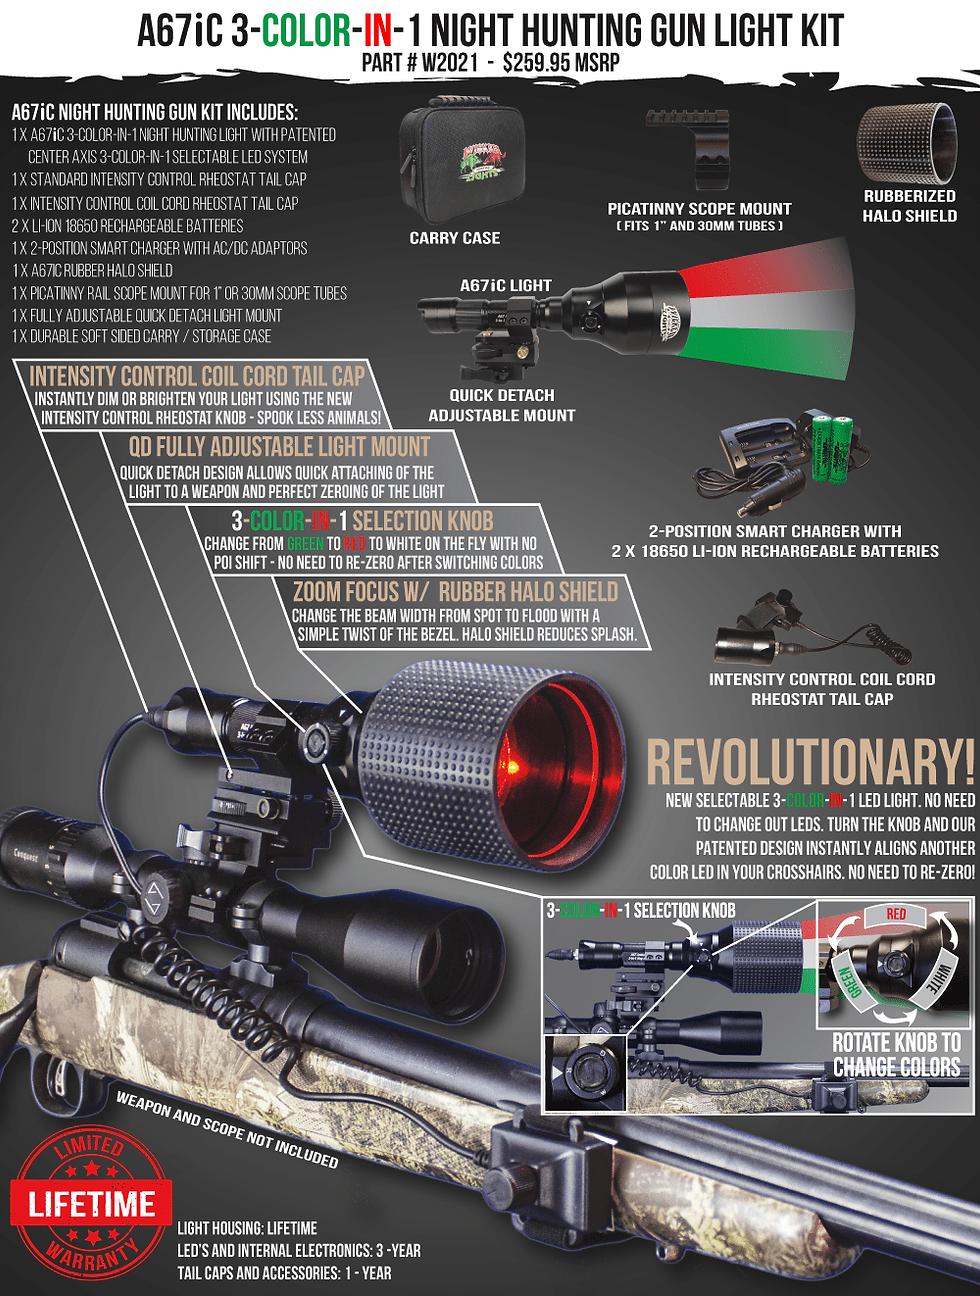 A67iC-Gun-Light-Kit-Contents-min.png